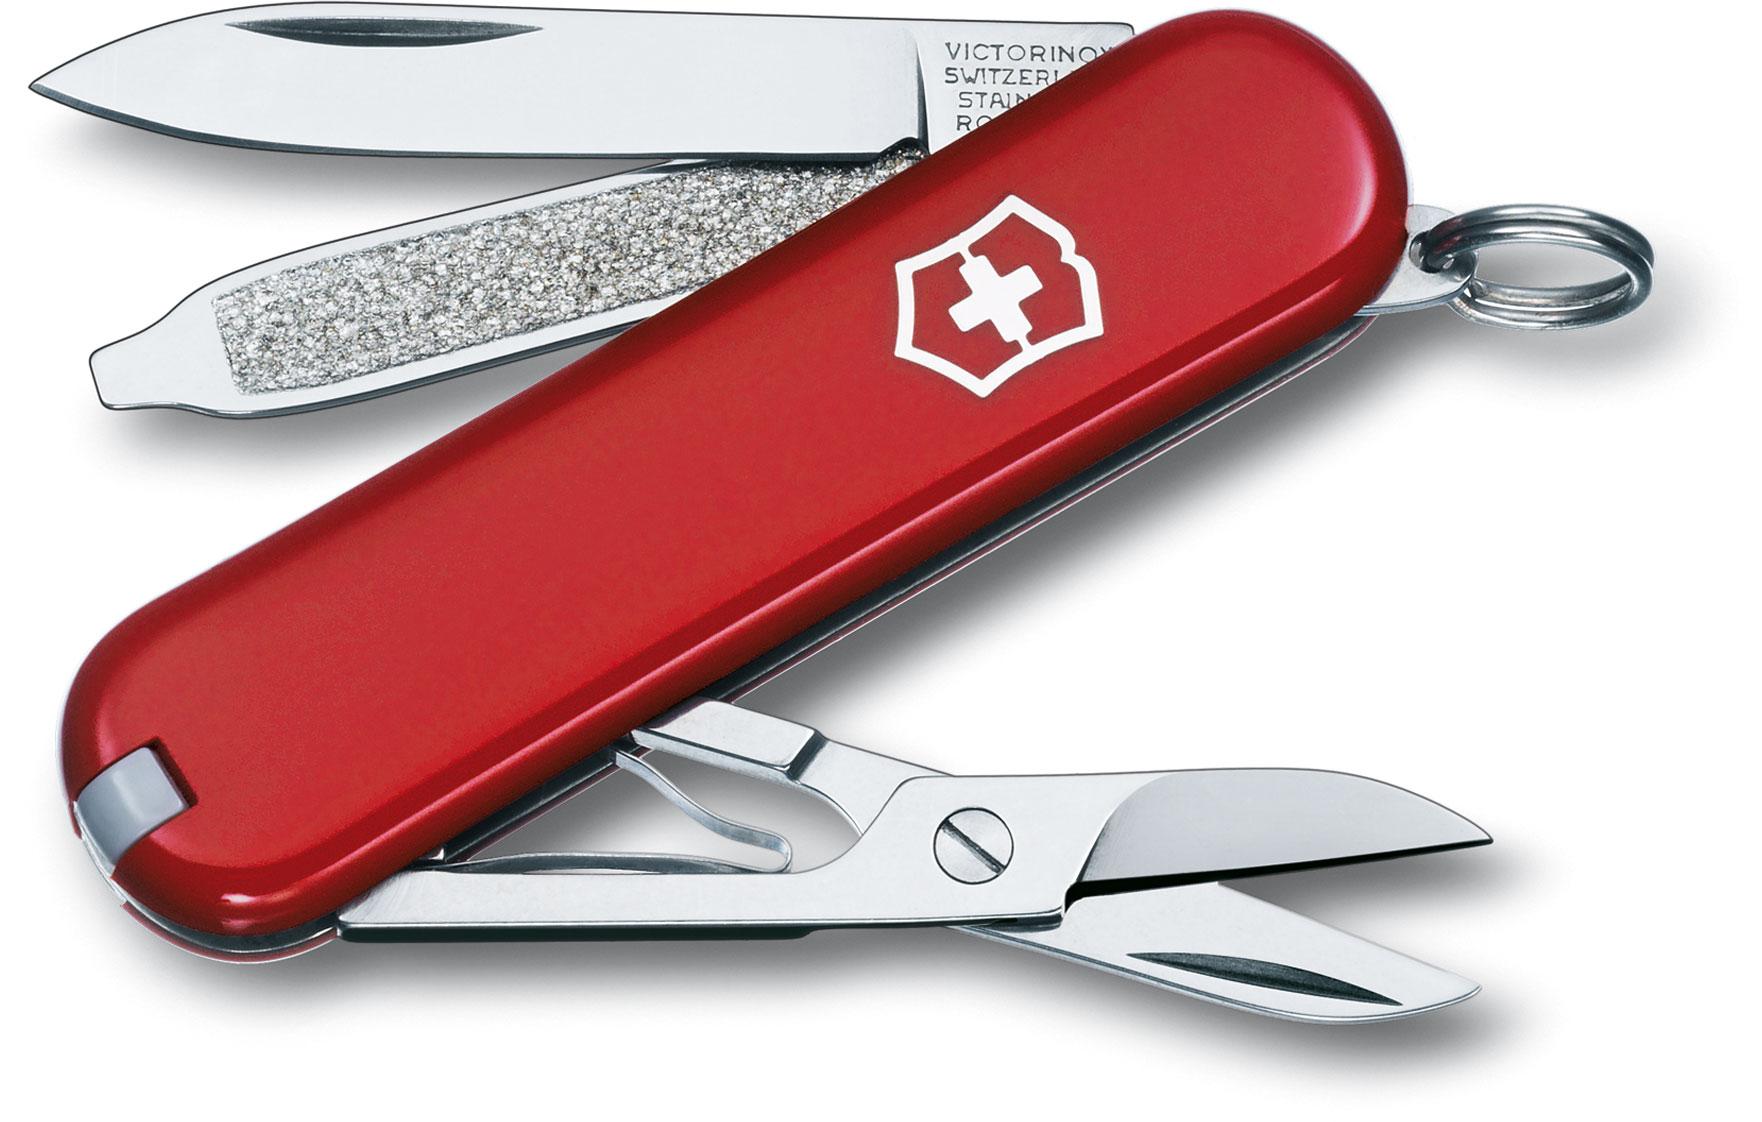 Victorinox Swiss Army Classic Sd Multi Tool Red 2 25